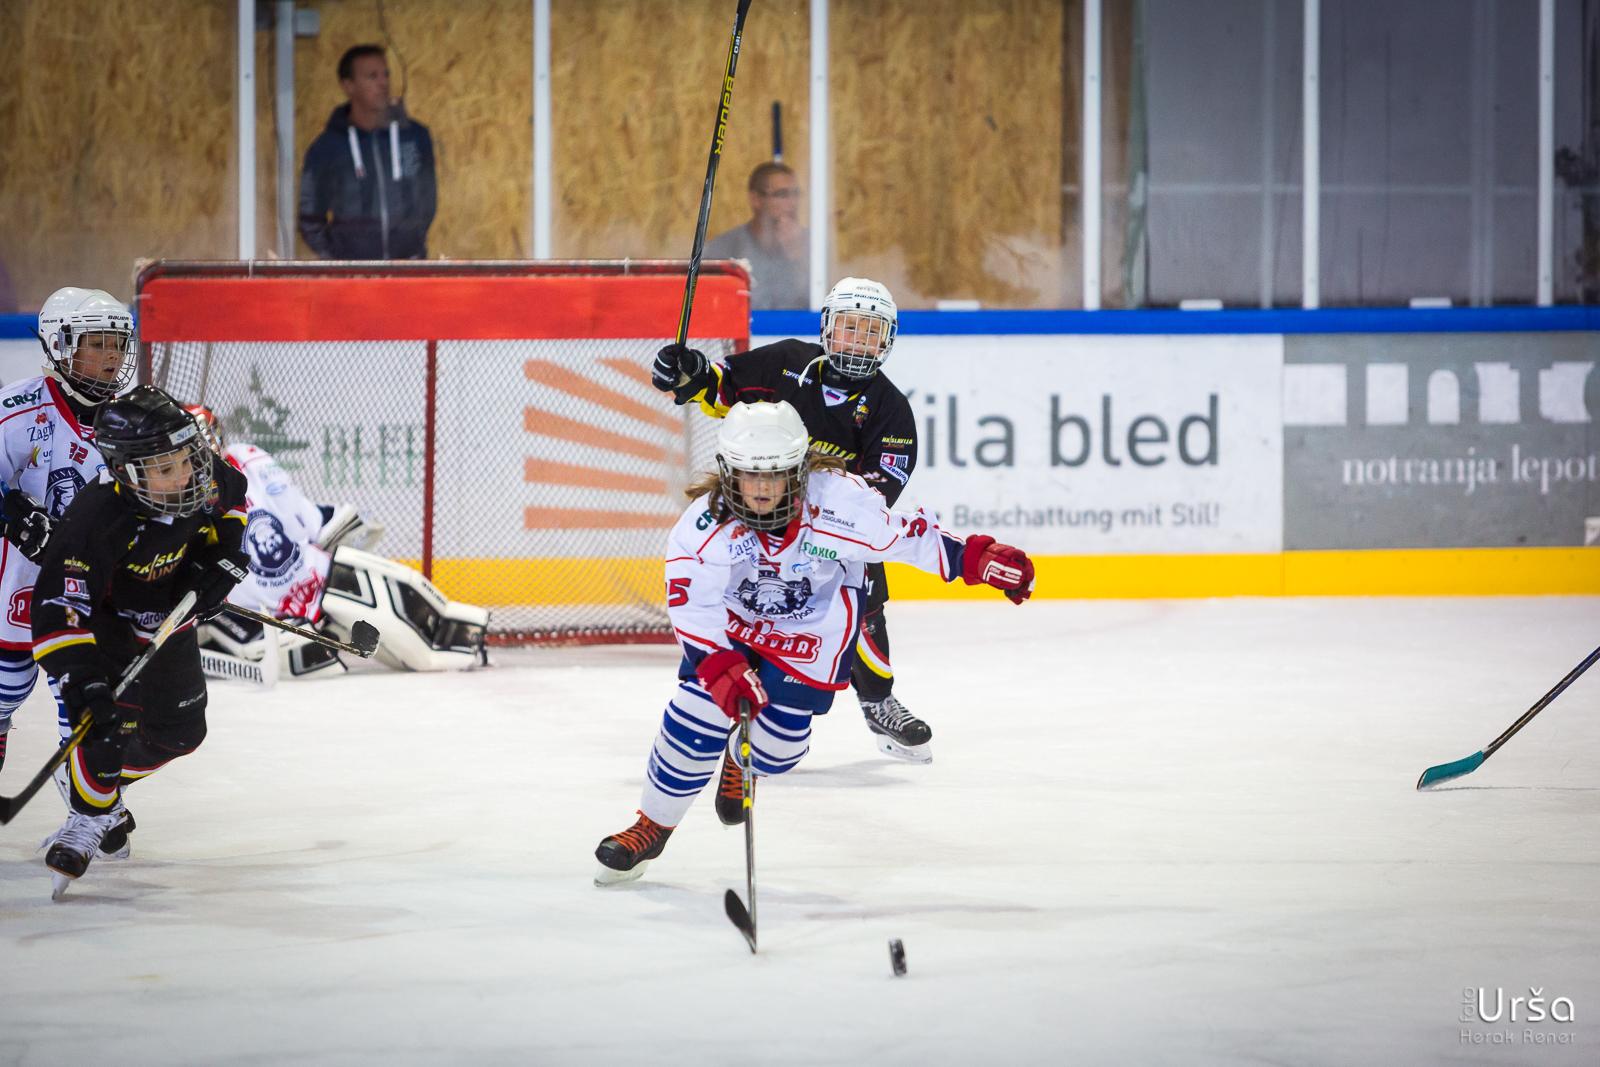 Mednarodni turnir U in U10 na Bledu